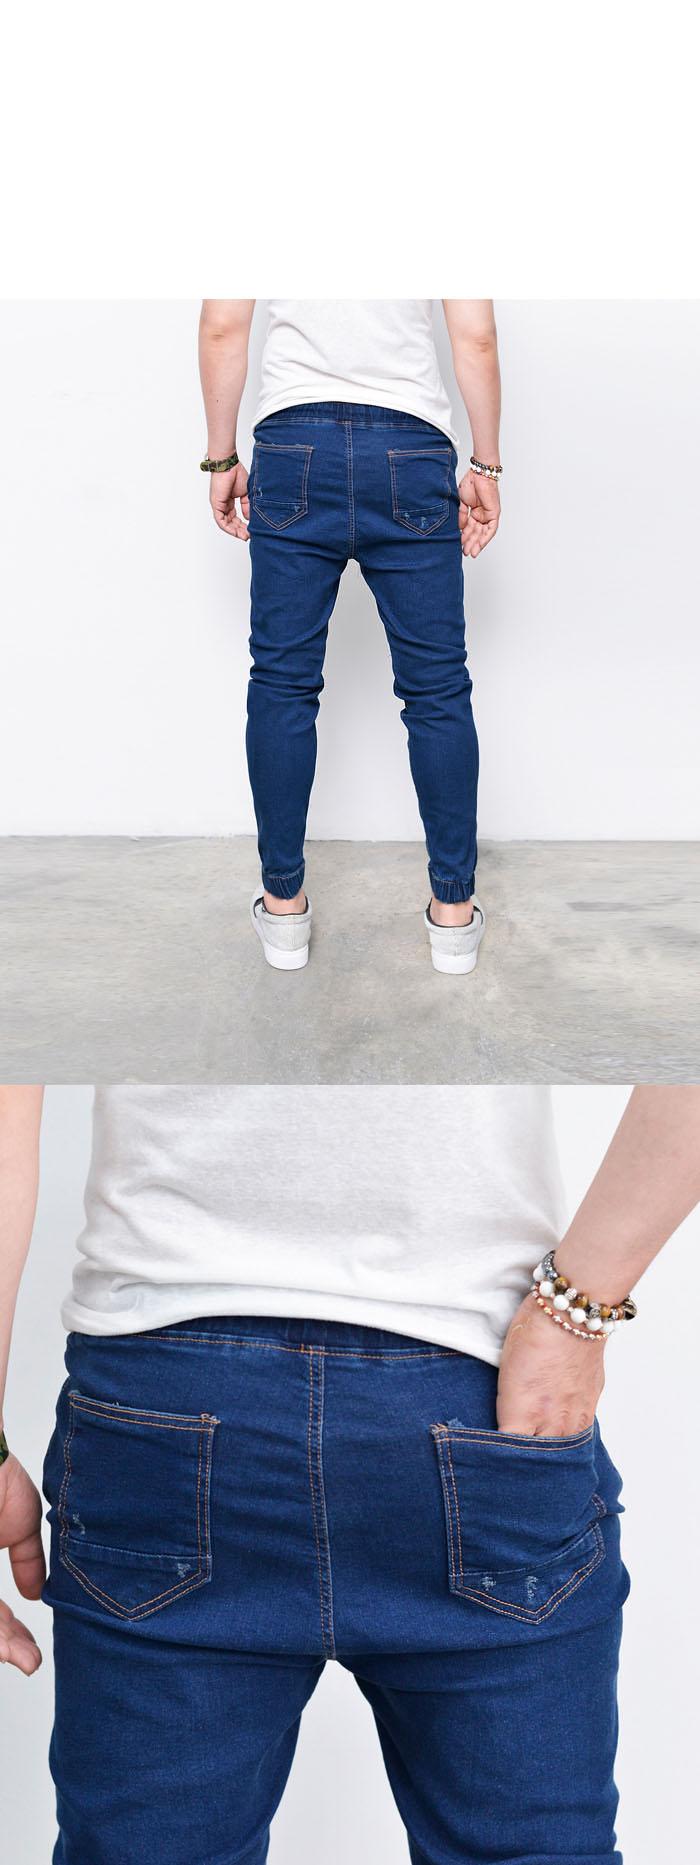 korea fashion slim semi baggy mens denim cuffed jogger pants sweatpants guylook ebay. Black Bedroom Furniture Sets. Home Design Ideas